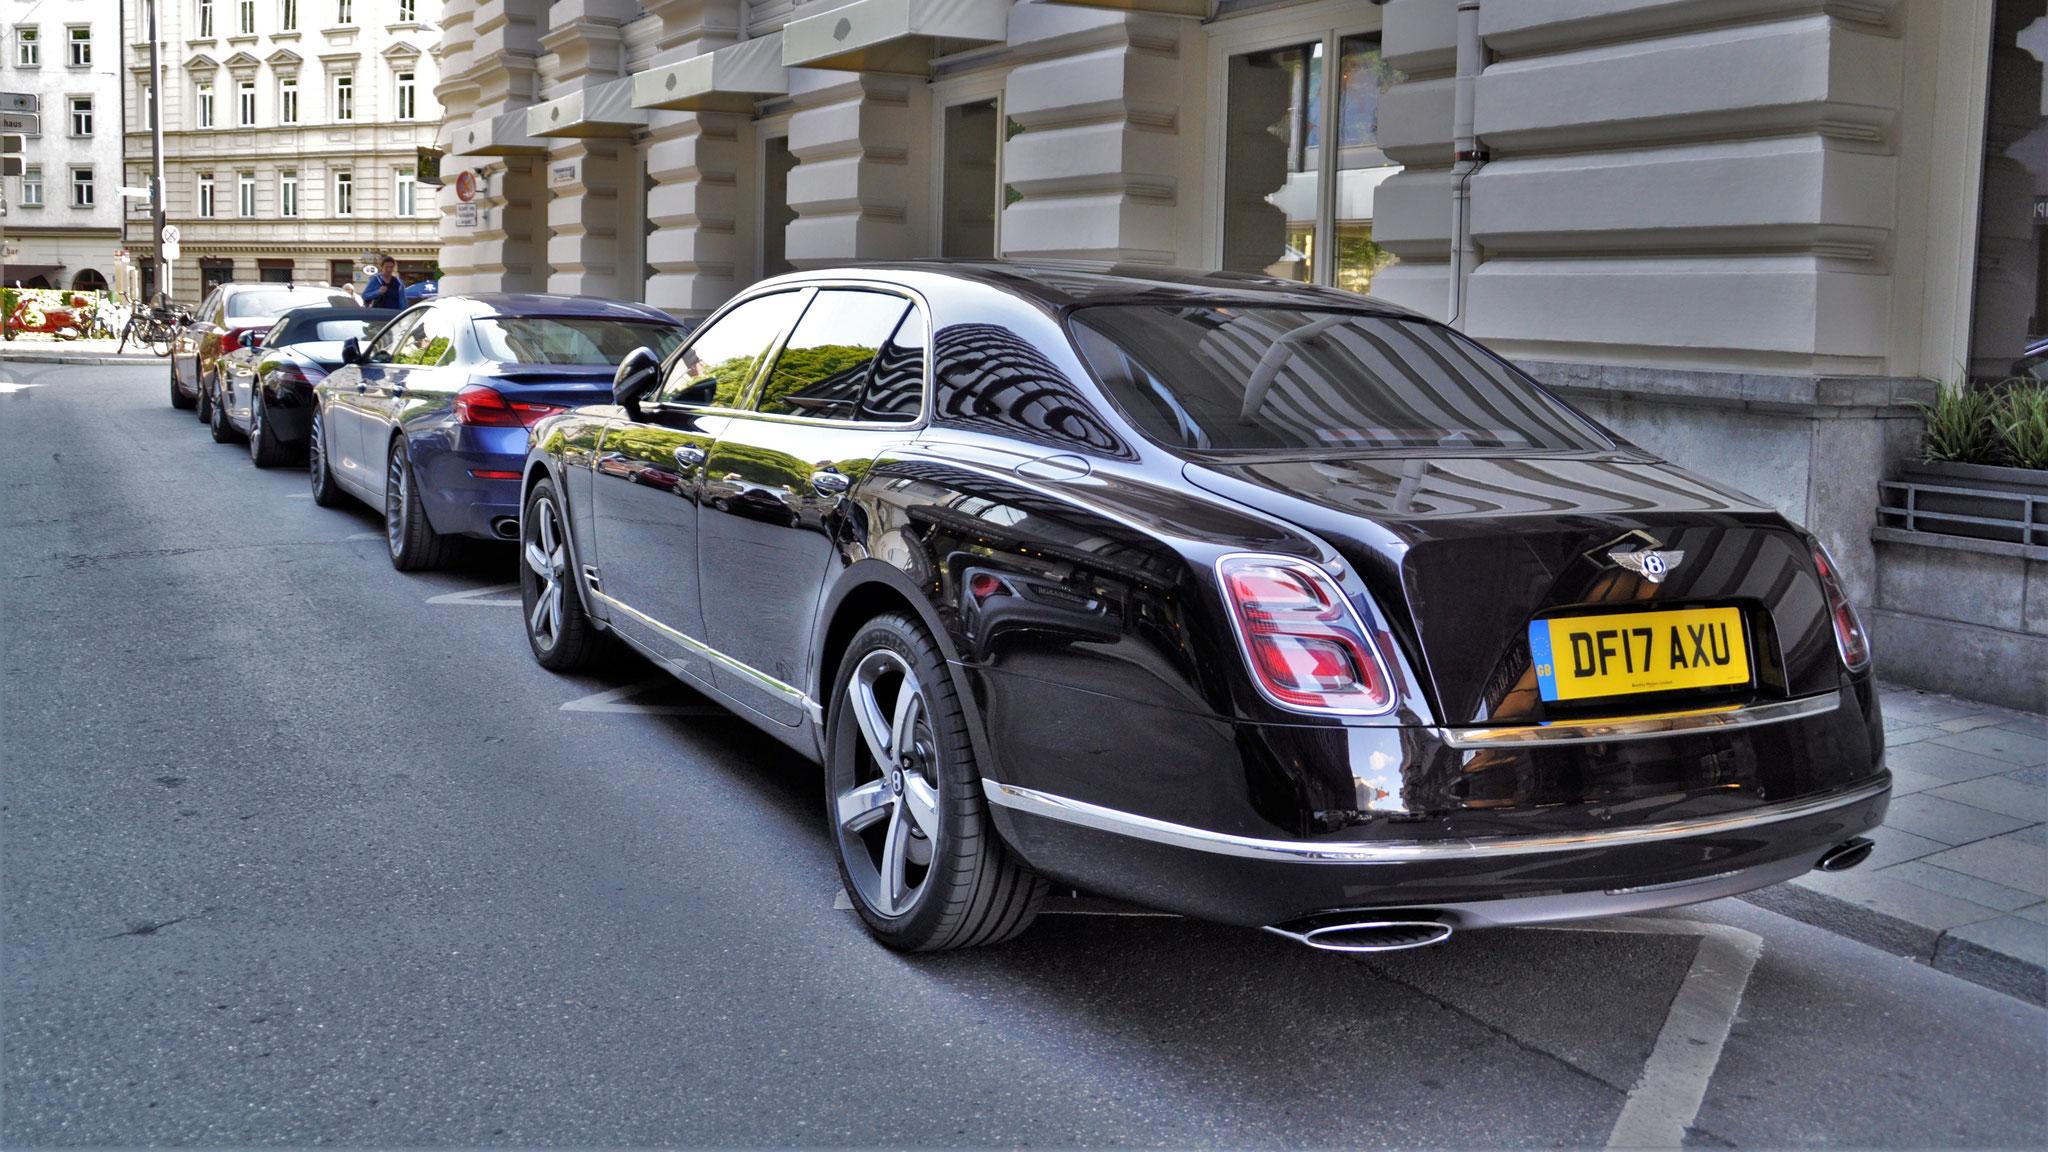 Bentley Mulsanne - DF17-AXU (GB)